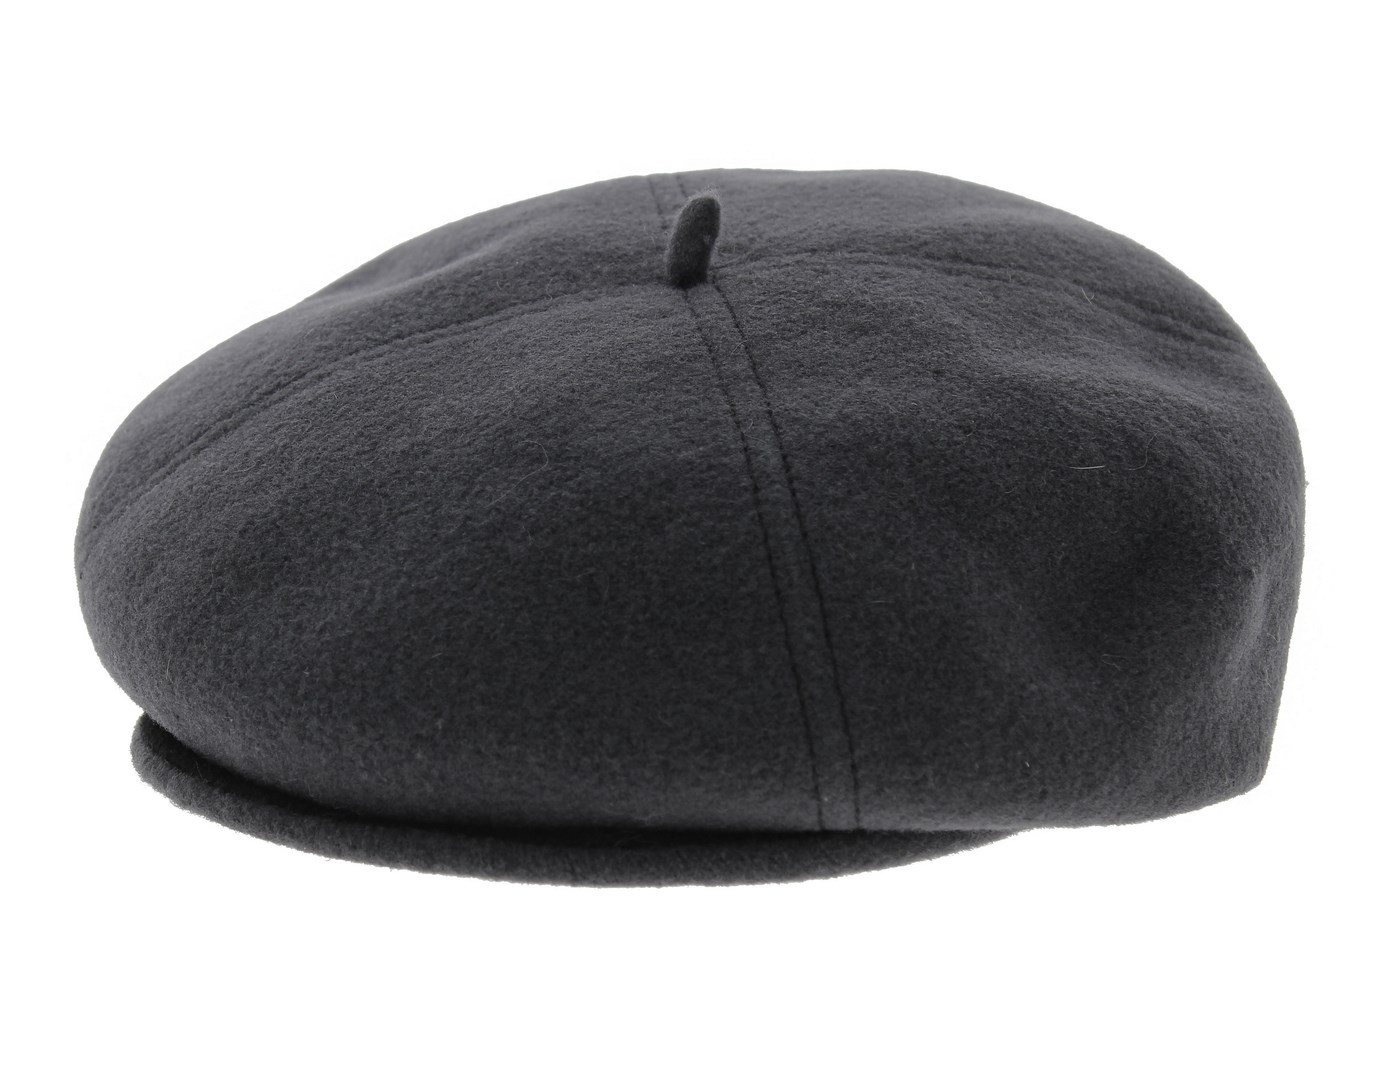 2c9ec3fb5e530 https   www.chapellerie-traclet.com en men-s-beanies 6217-bonnet ...